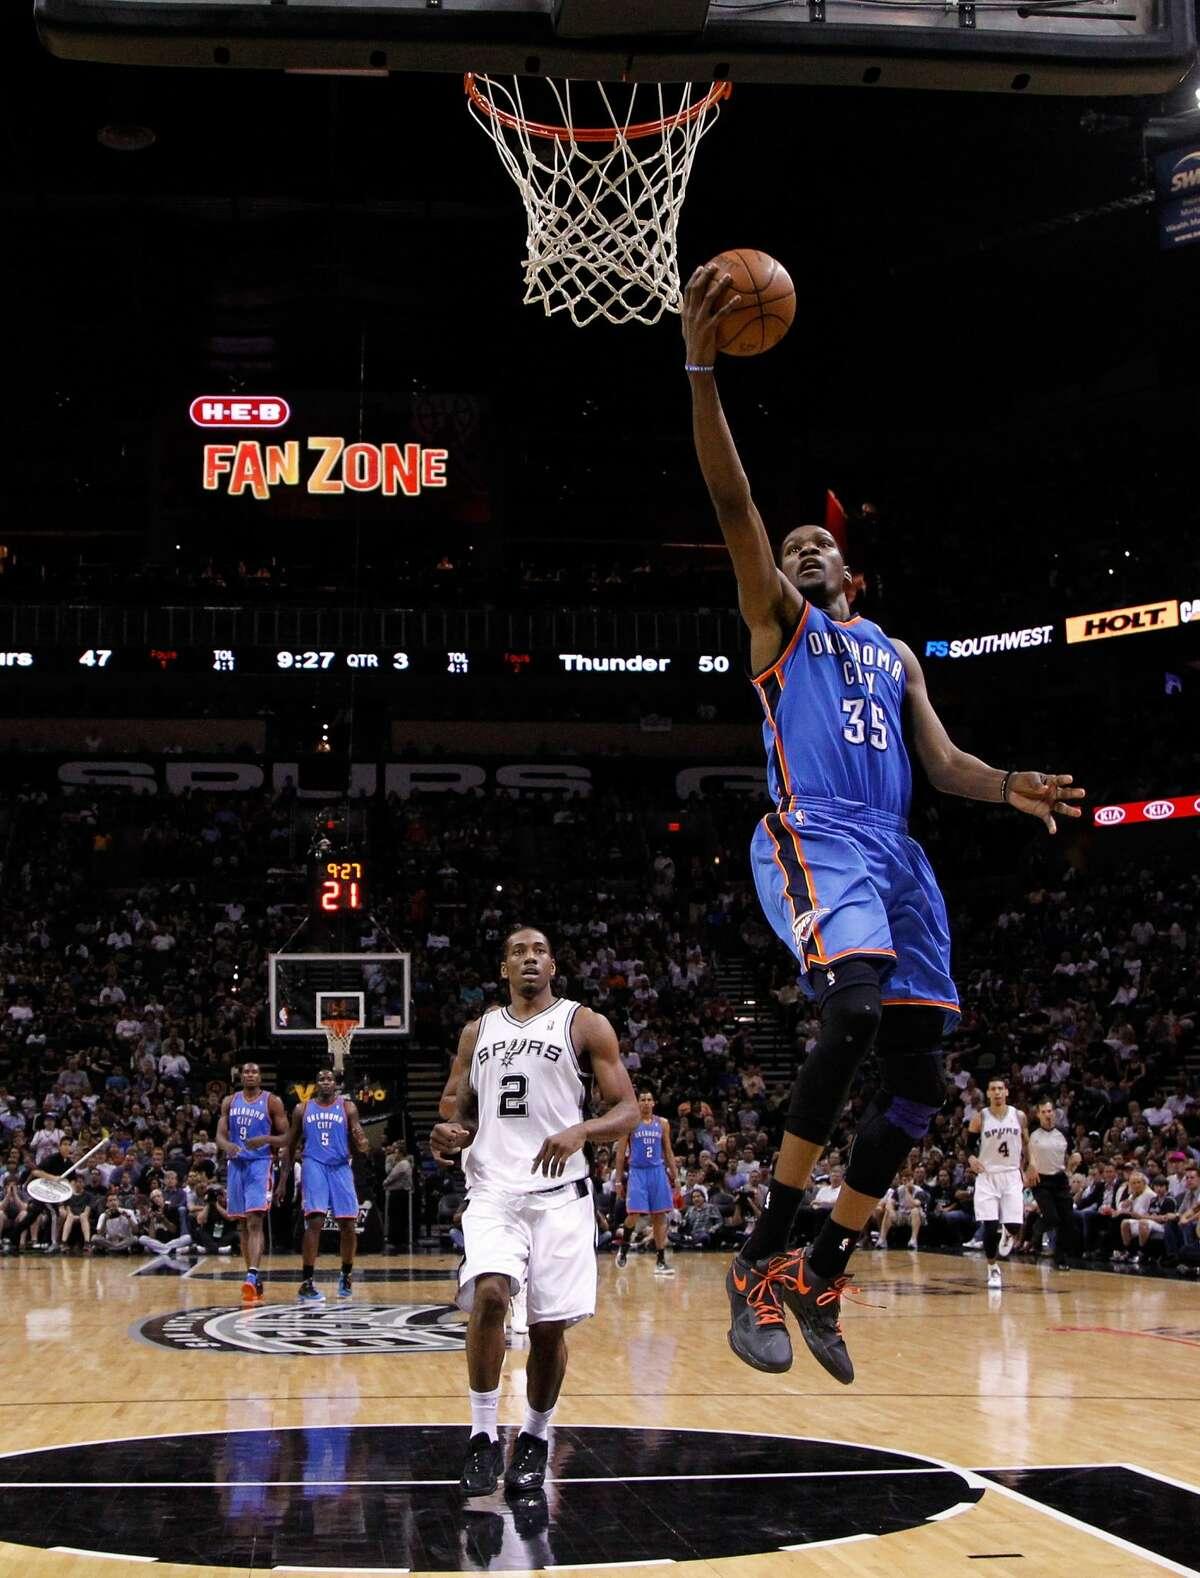 Jan. 8, 2012 : Thunder 108, Spurs 96 Durant: 21 points (5-9 FG/10-10 FT), 10 rebounds, 7 assists, 5 turnovers Leonard: 13 points (6-10 FG), 10 rebounds, 2 steals, 1 turnover